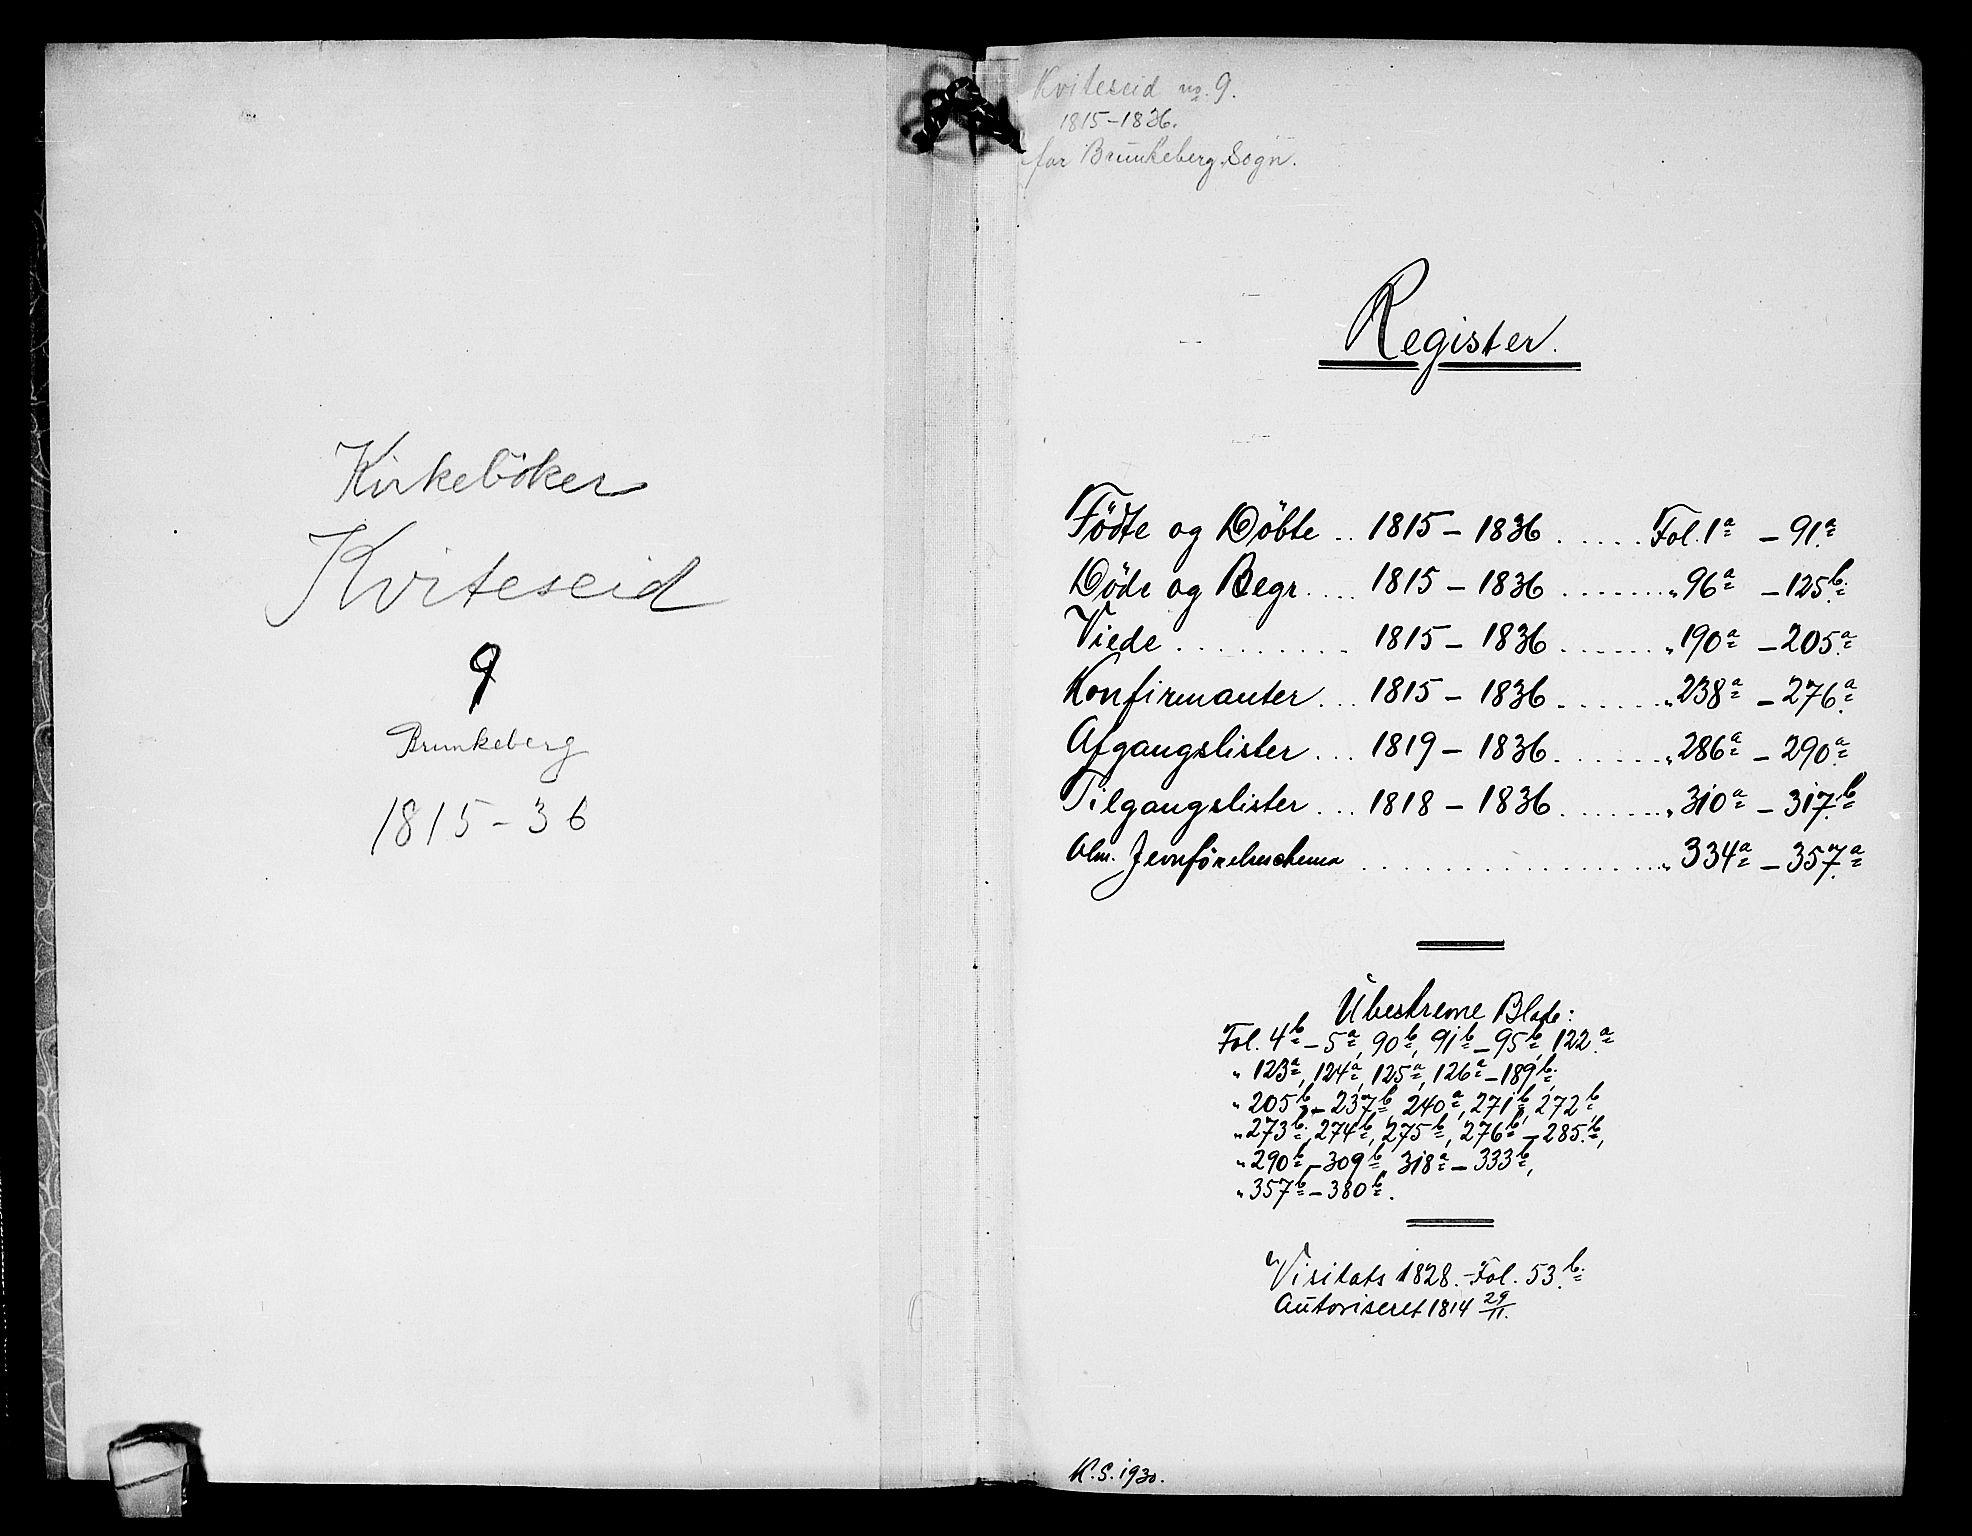 SAKO, Kviteseid kirkebøker, F/Fb/L0001: Ministerialbok nr. II 1, 1815-1836